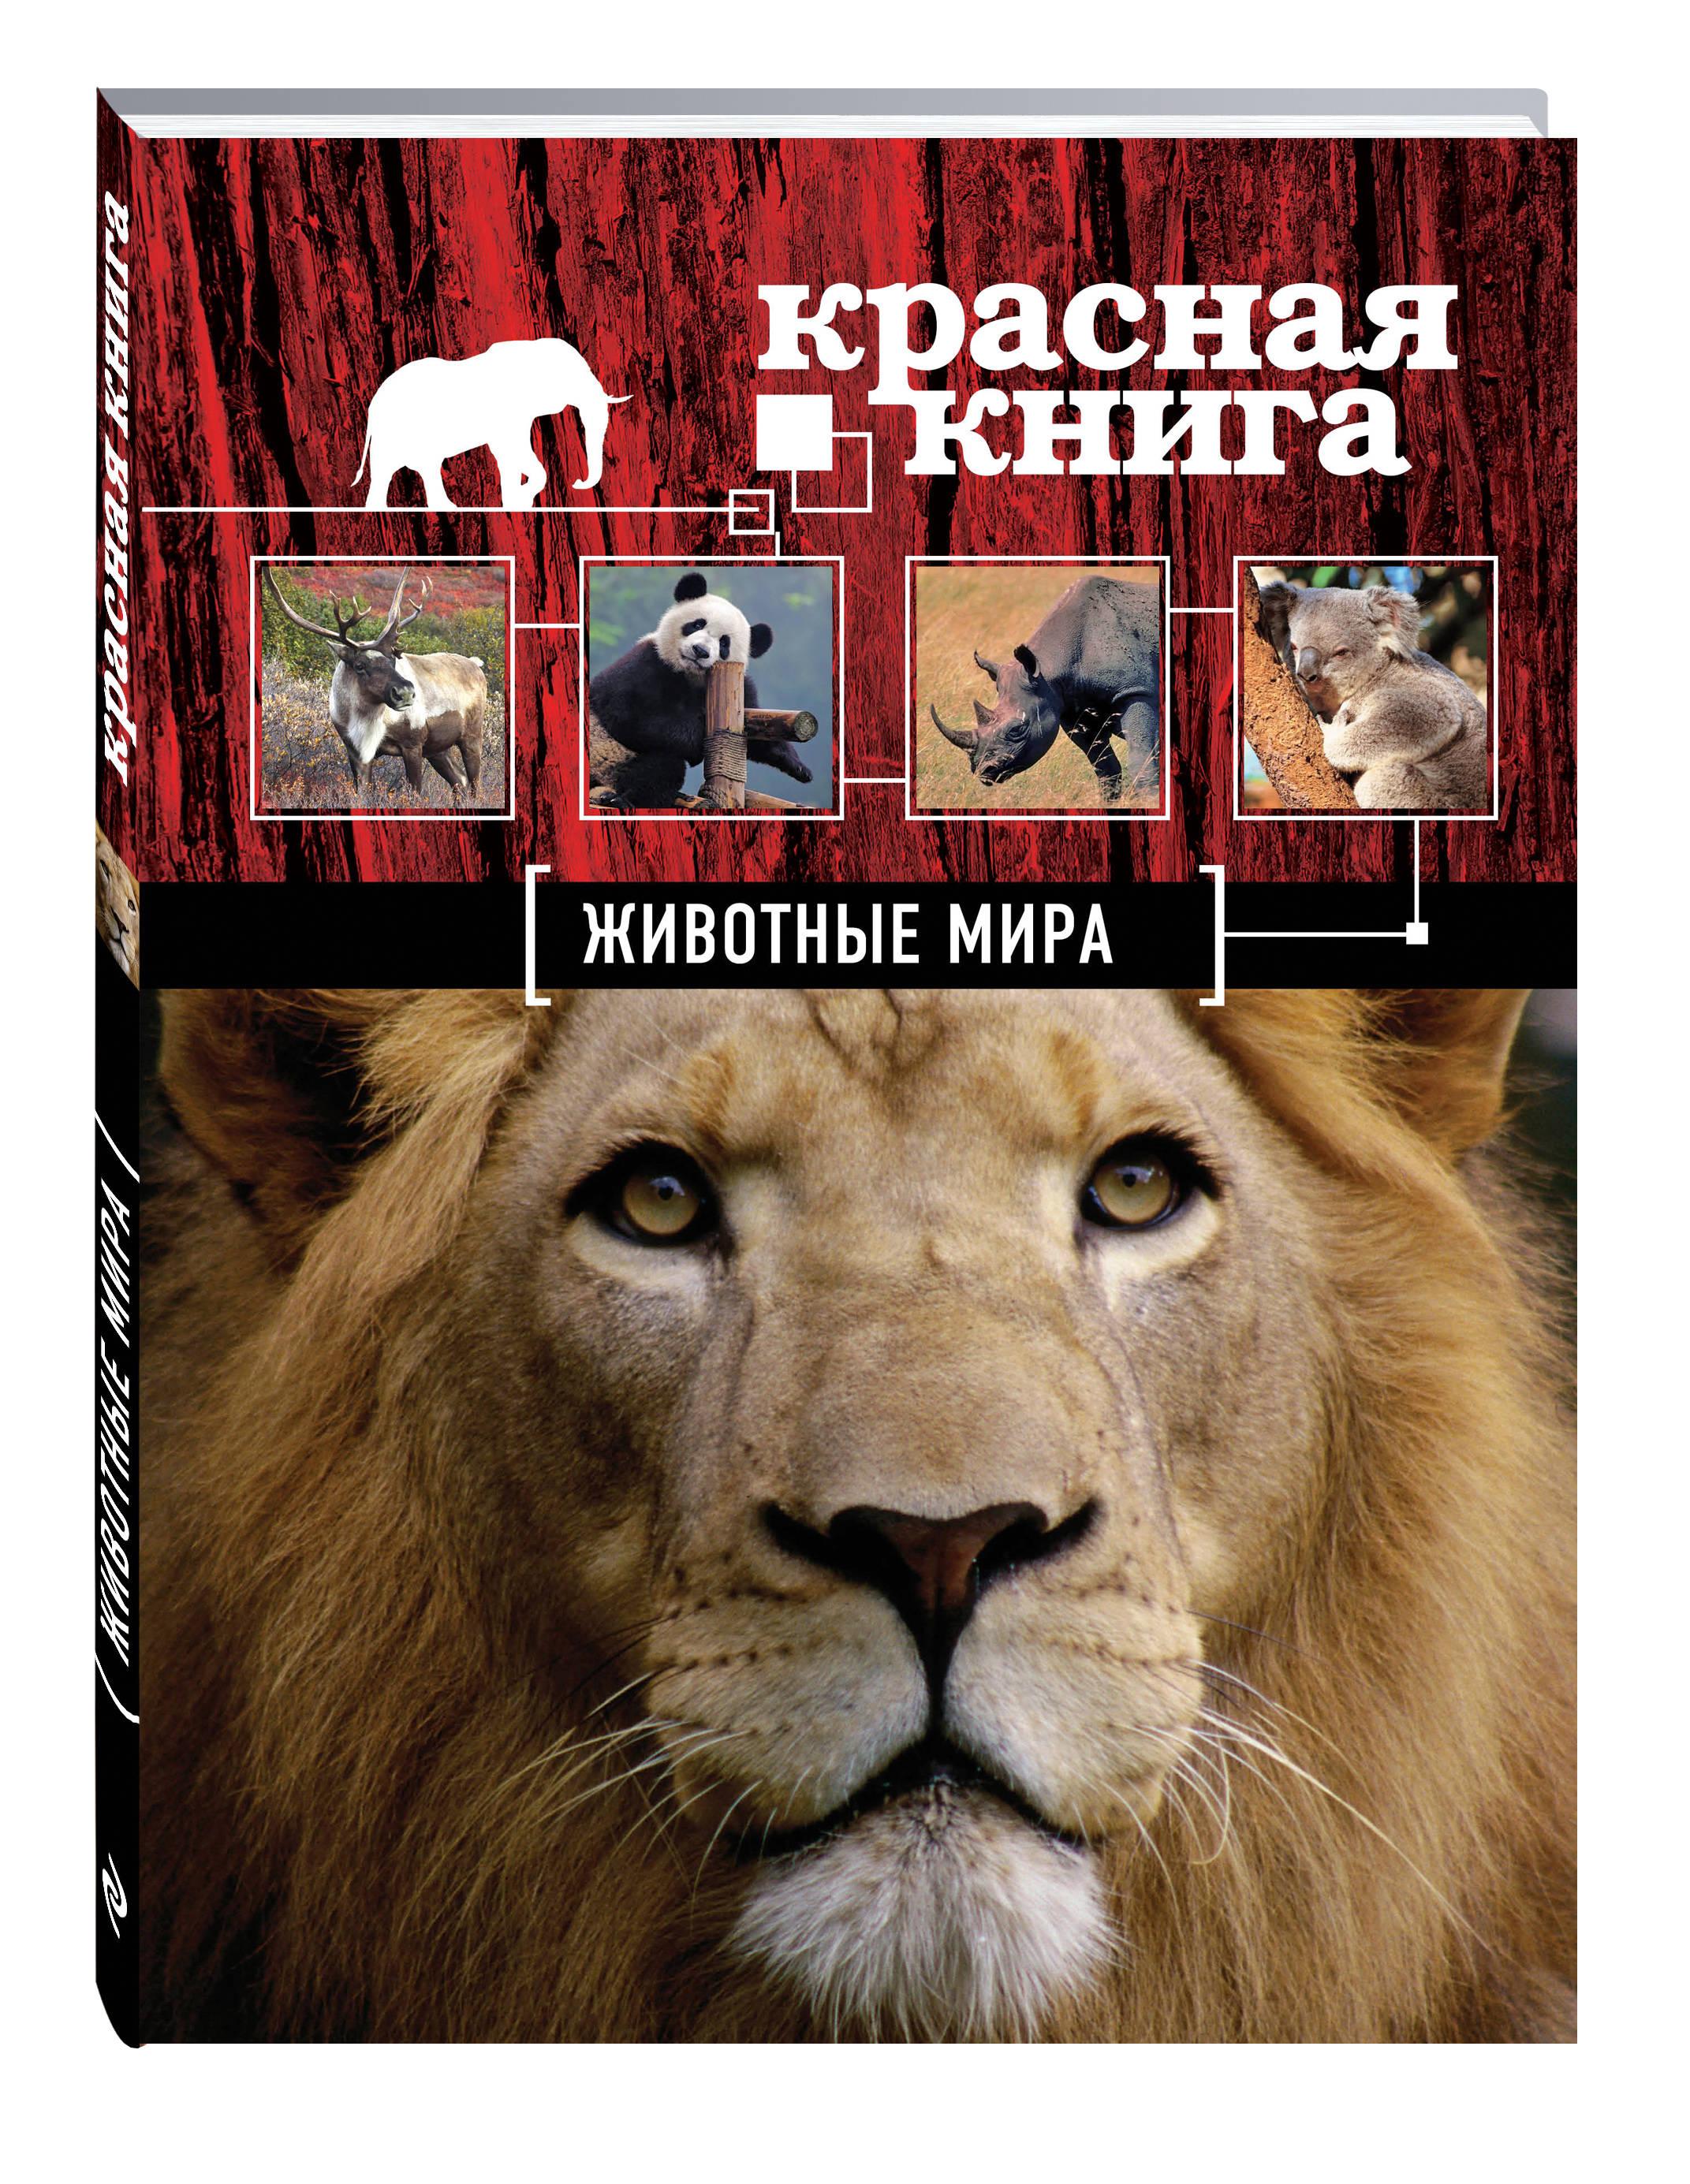 Оксана Скалдина, Евгений Слиж Красная книга. Животные мира оксана скалдина красная книга животные мира